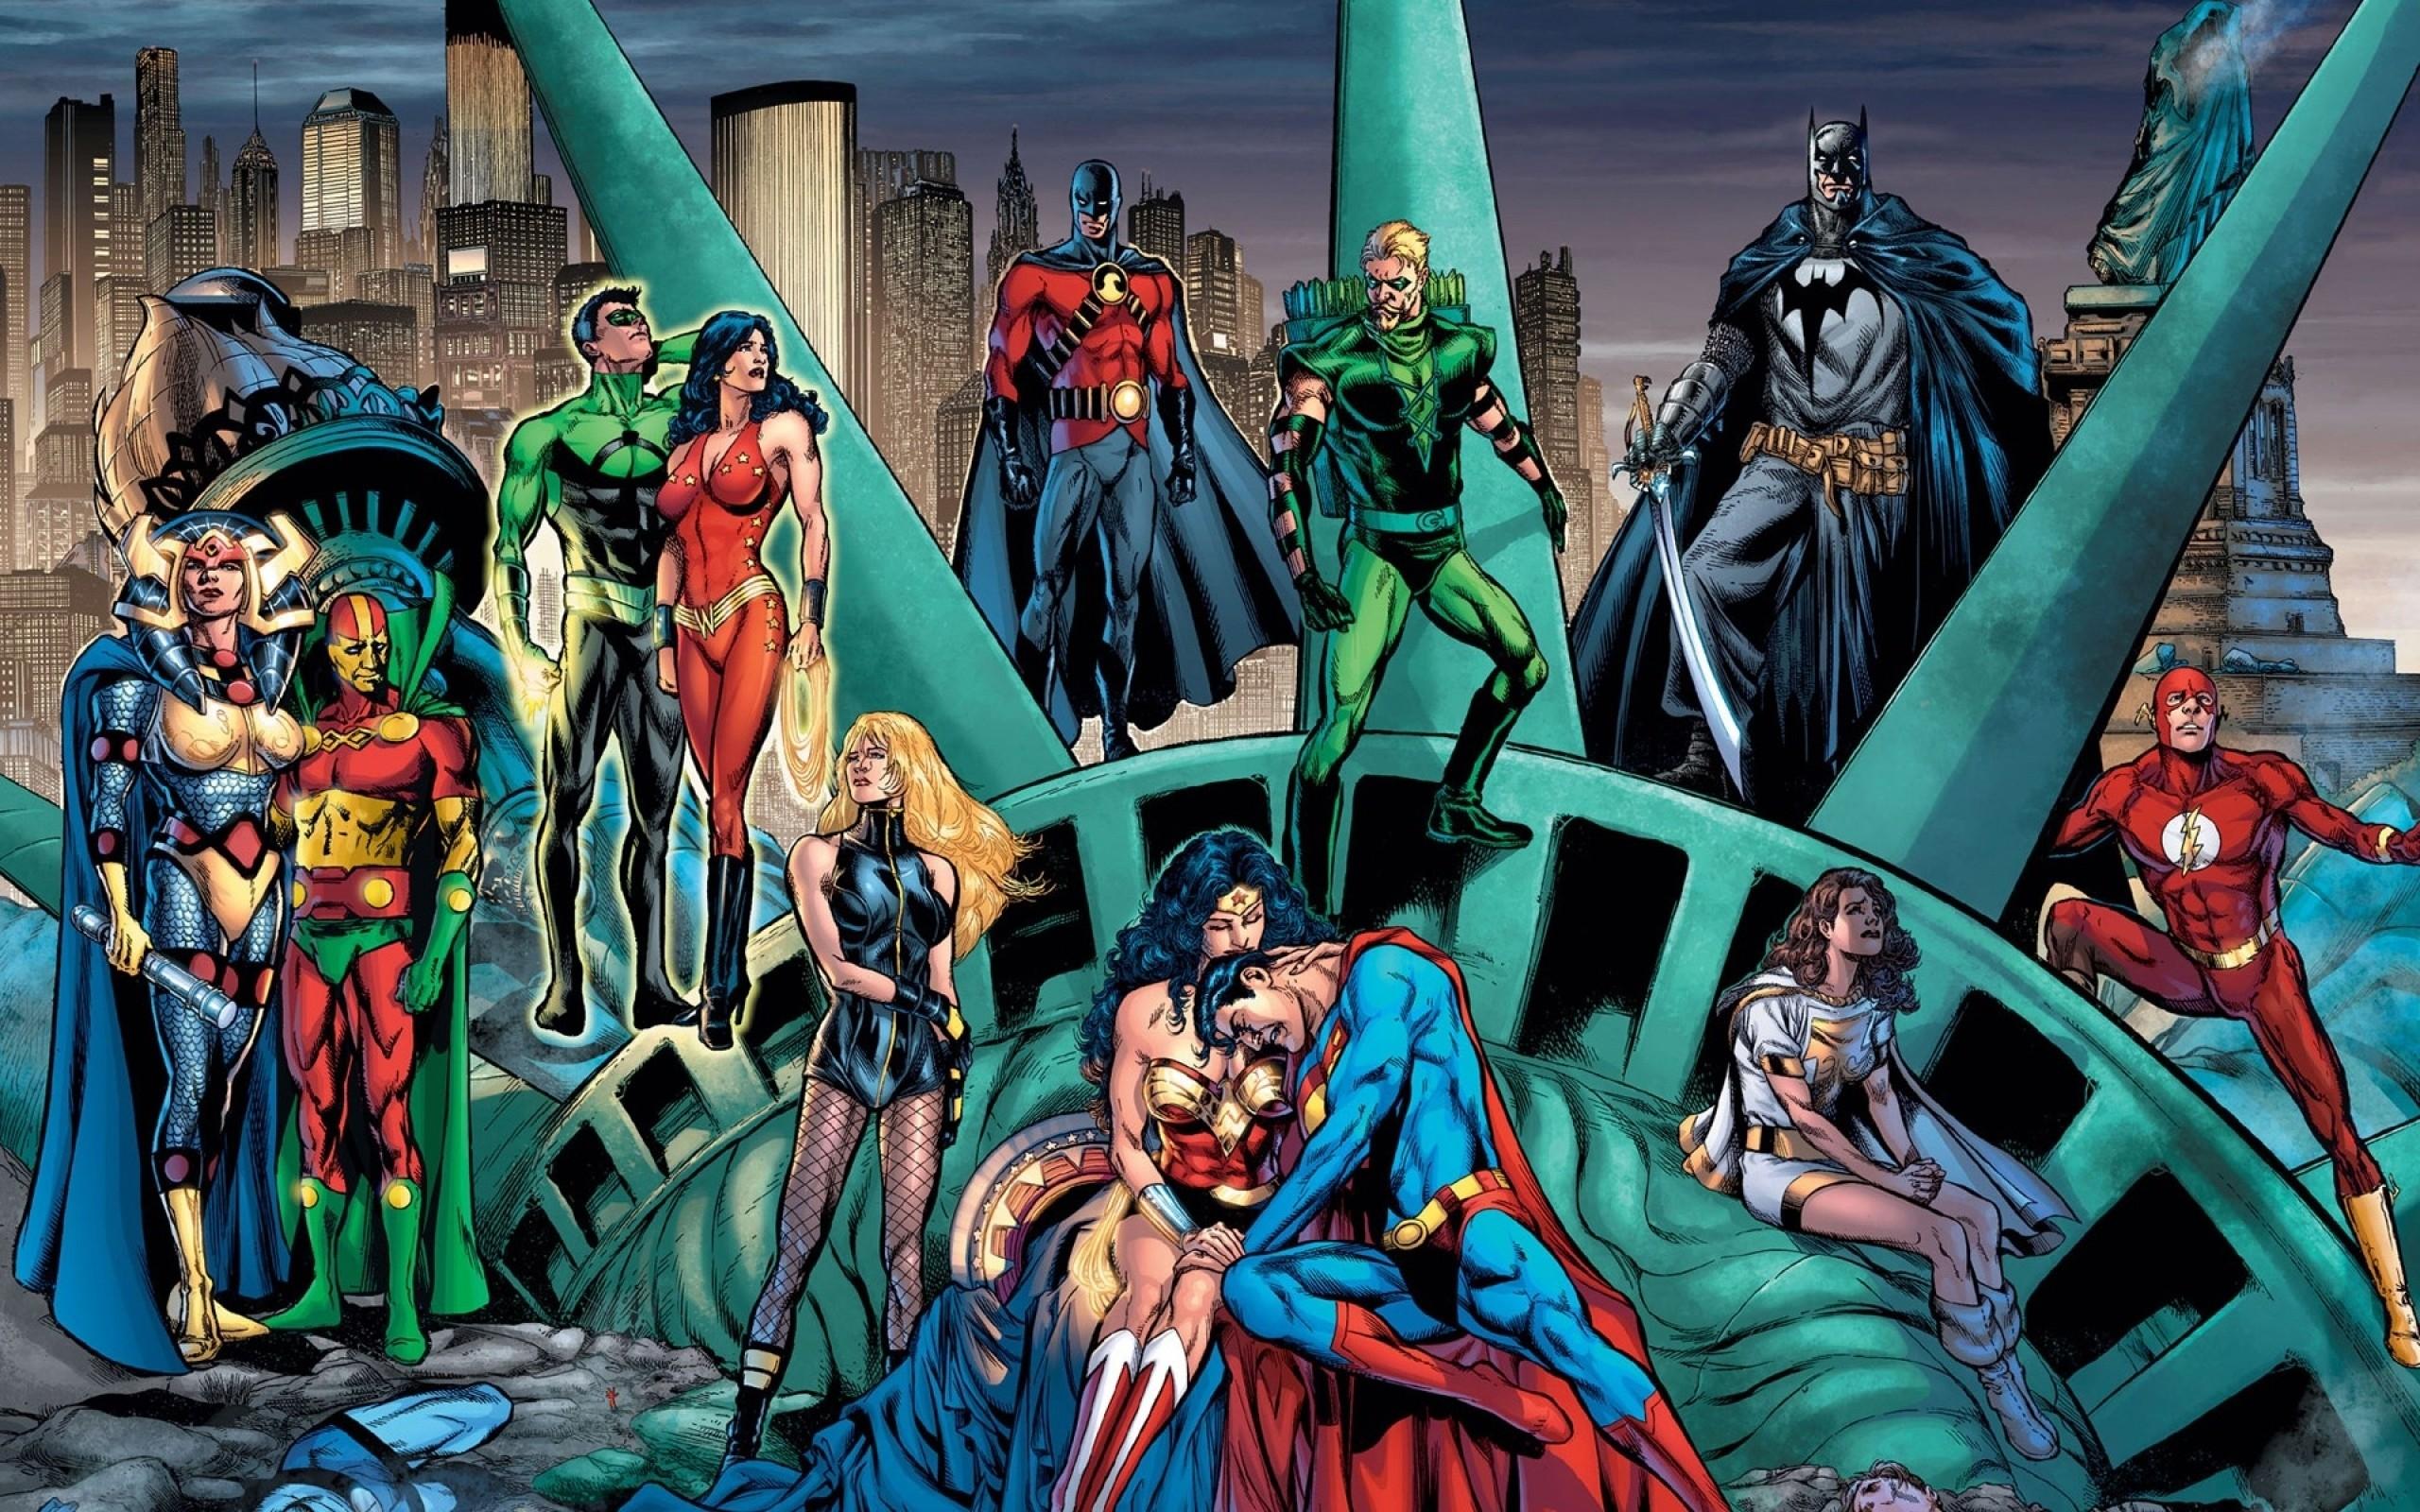 Vixen wallpaper | DC Universe wallpaper | Pinterest | Vixen, DC Universe  and Universe